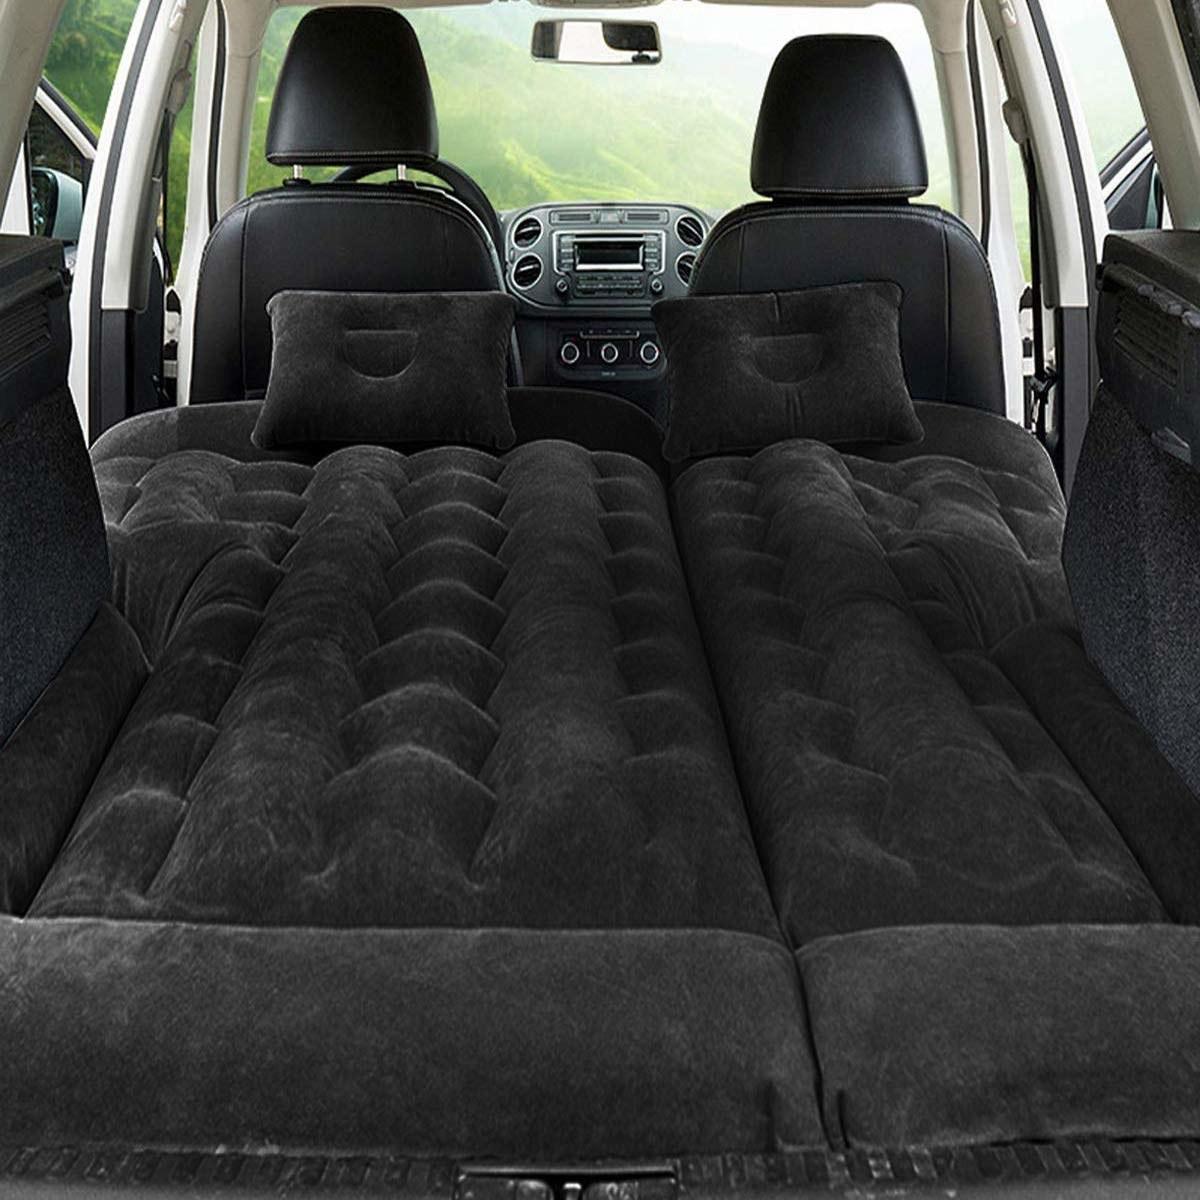 Padded air mattress inside back of car